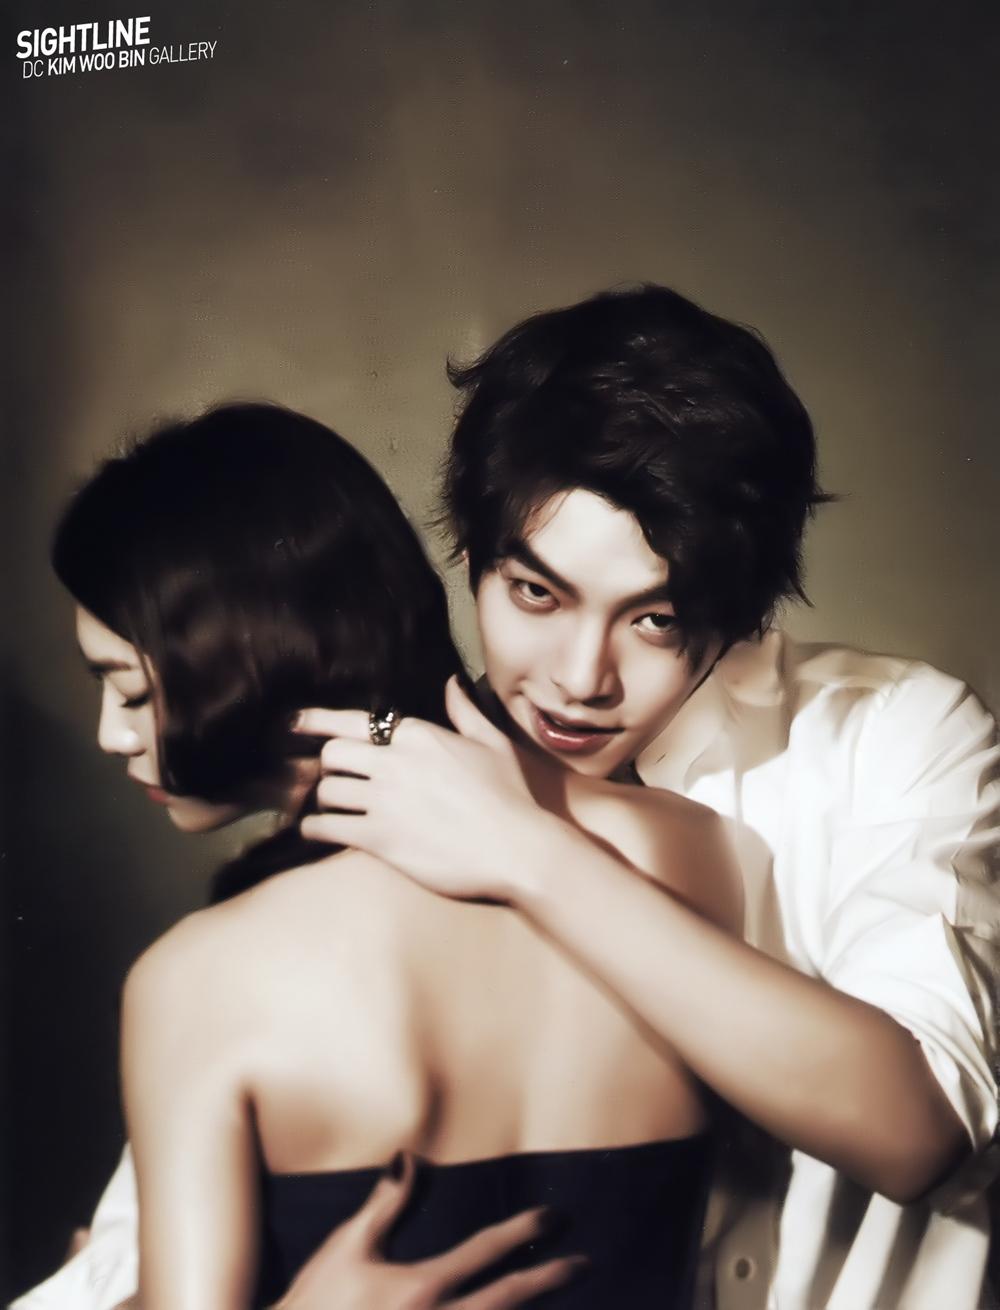 singles kim woo bin